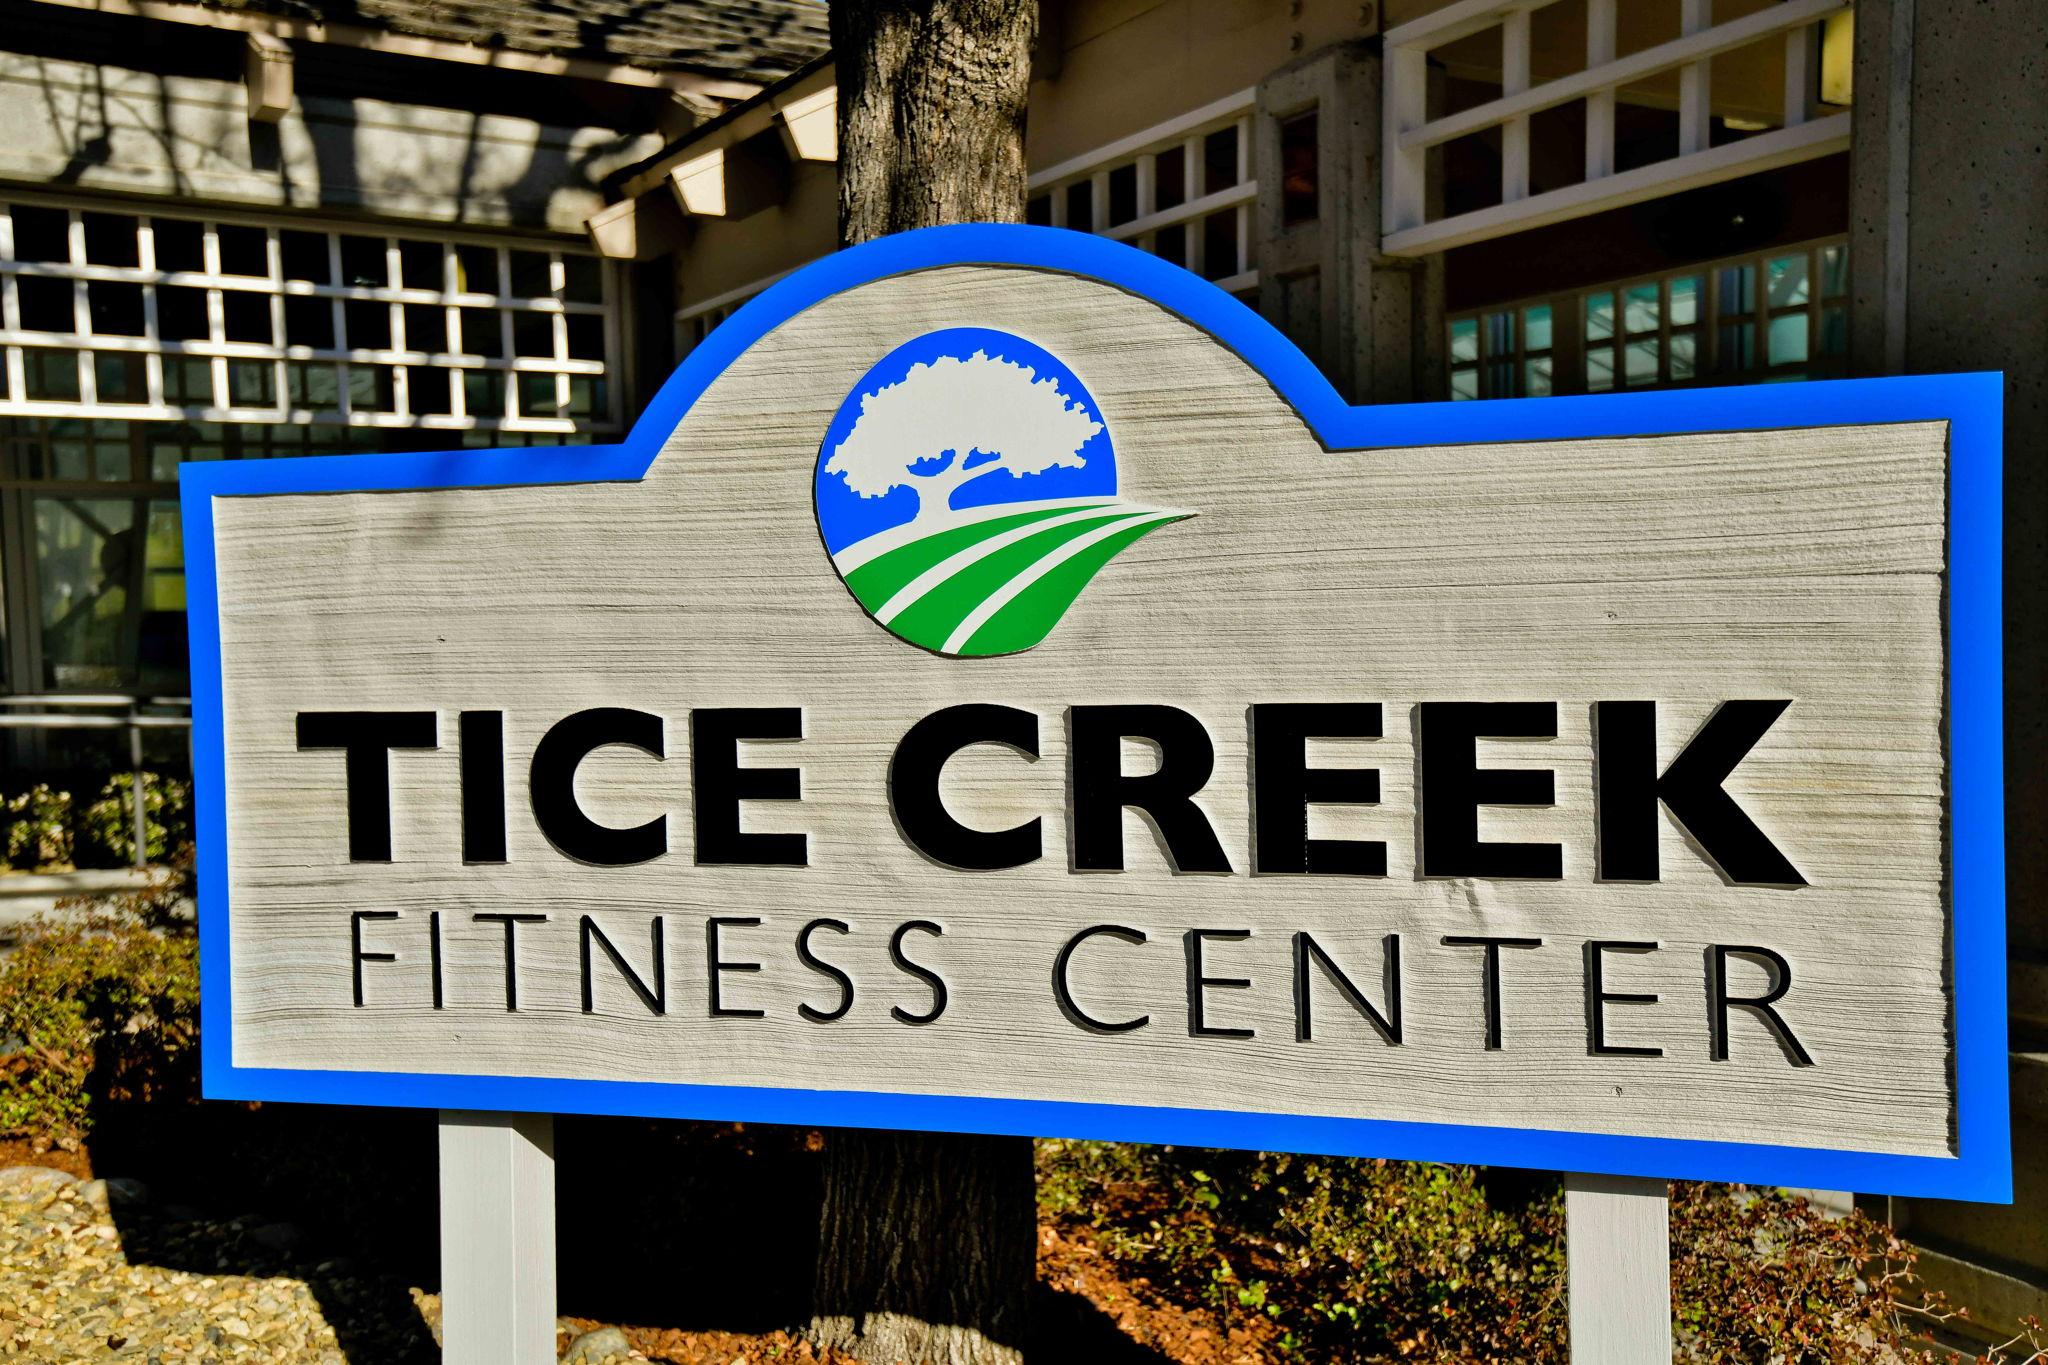 Rossmoor Fitness Center